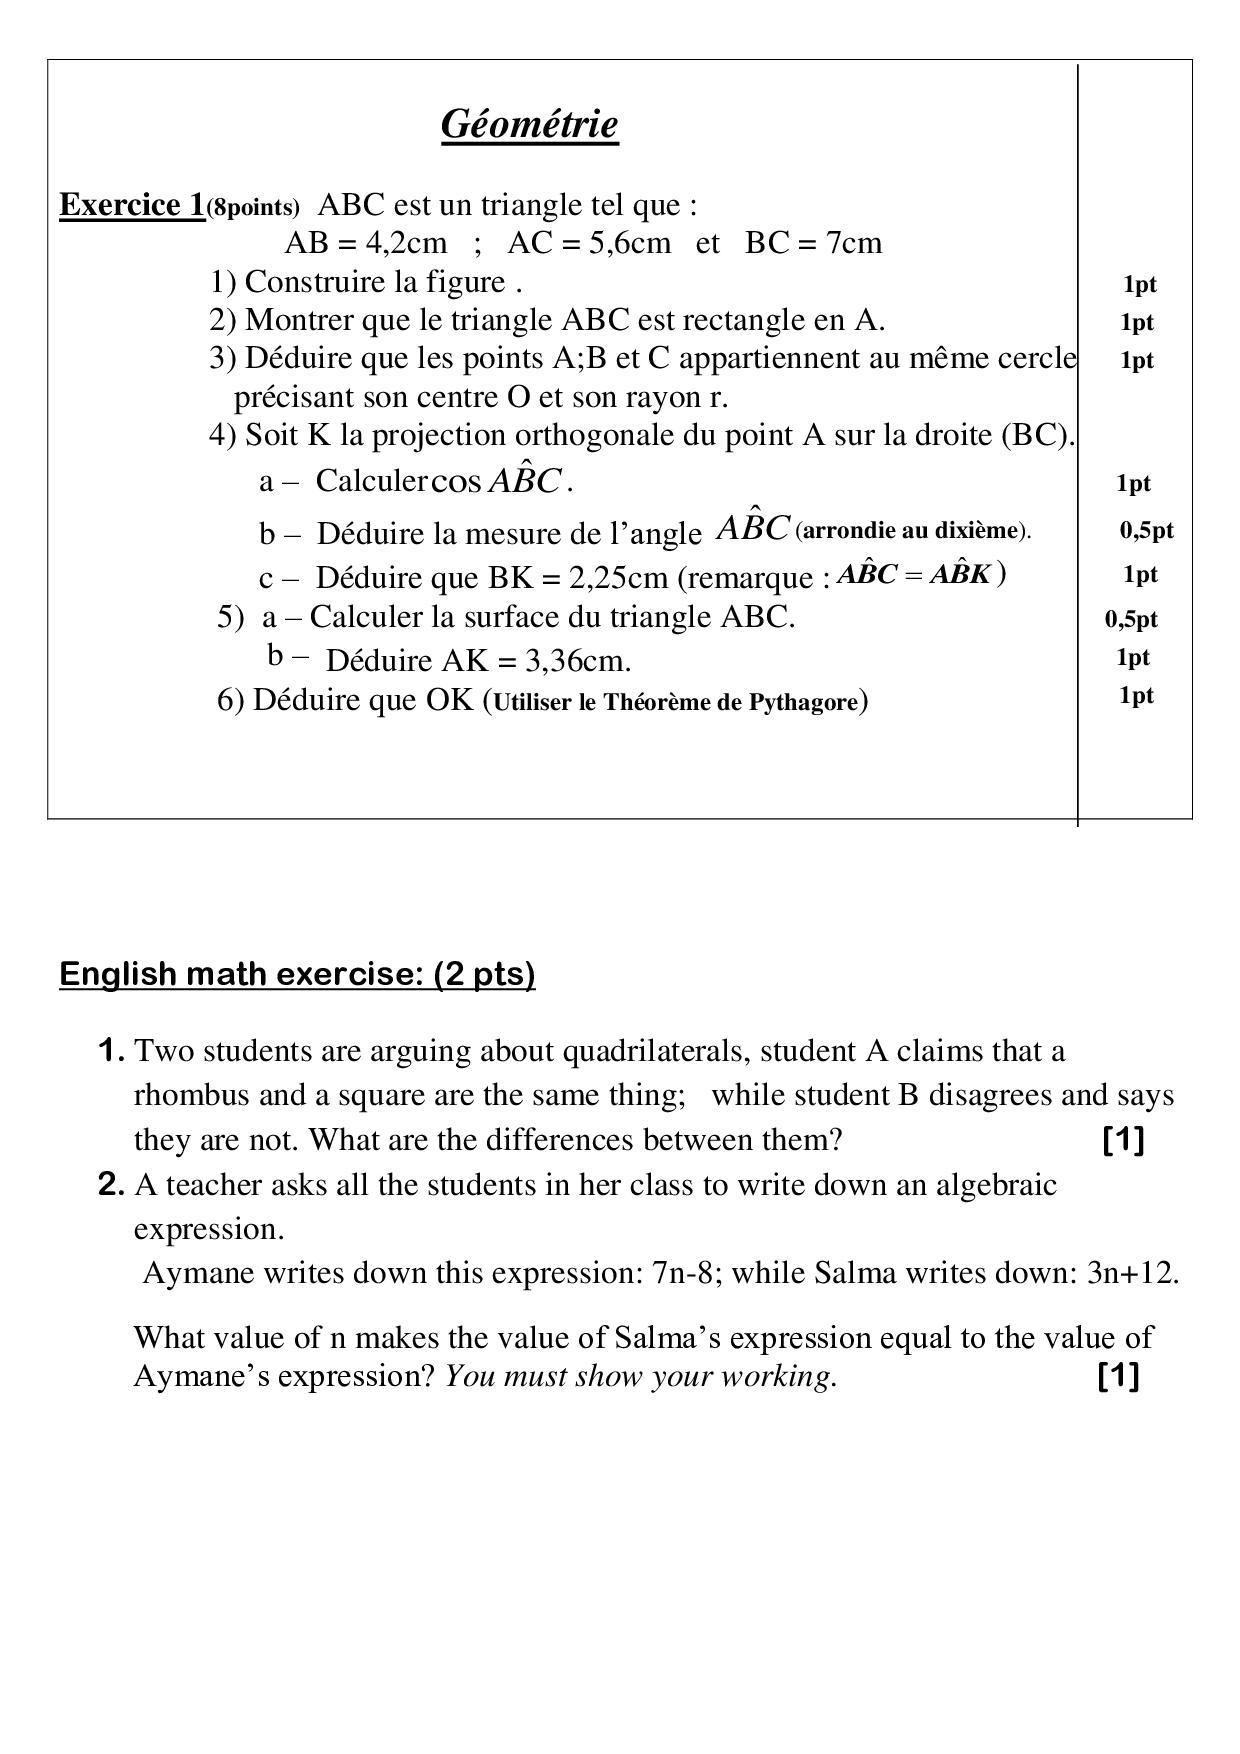 Devoir 1 Modèle 2 - Mathématiques 2AC Semestre 2 - AlloSchool